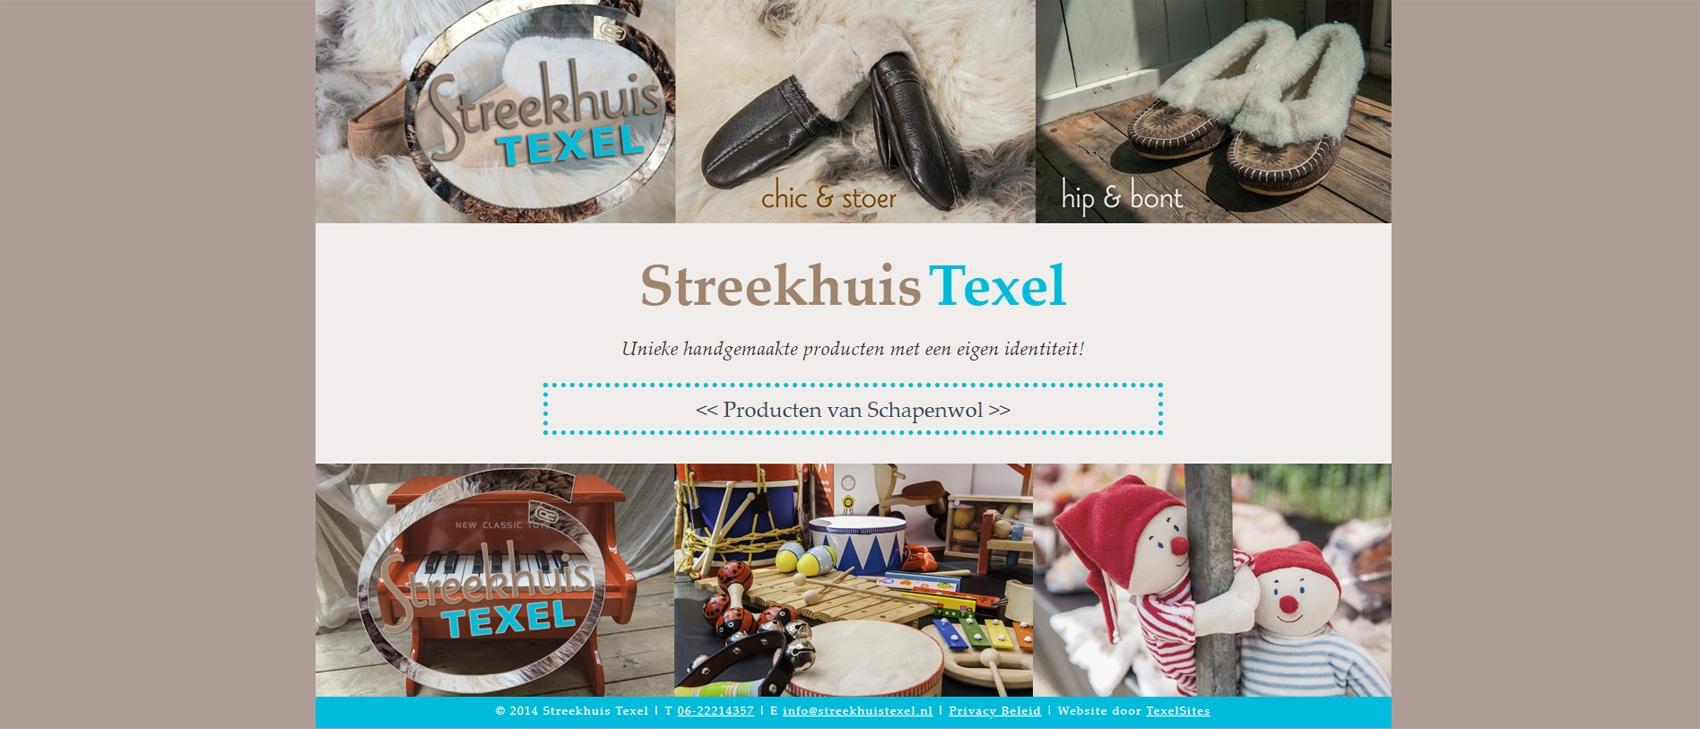 Streekhuis Texel